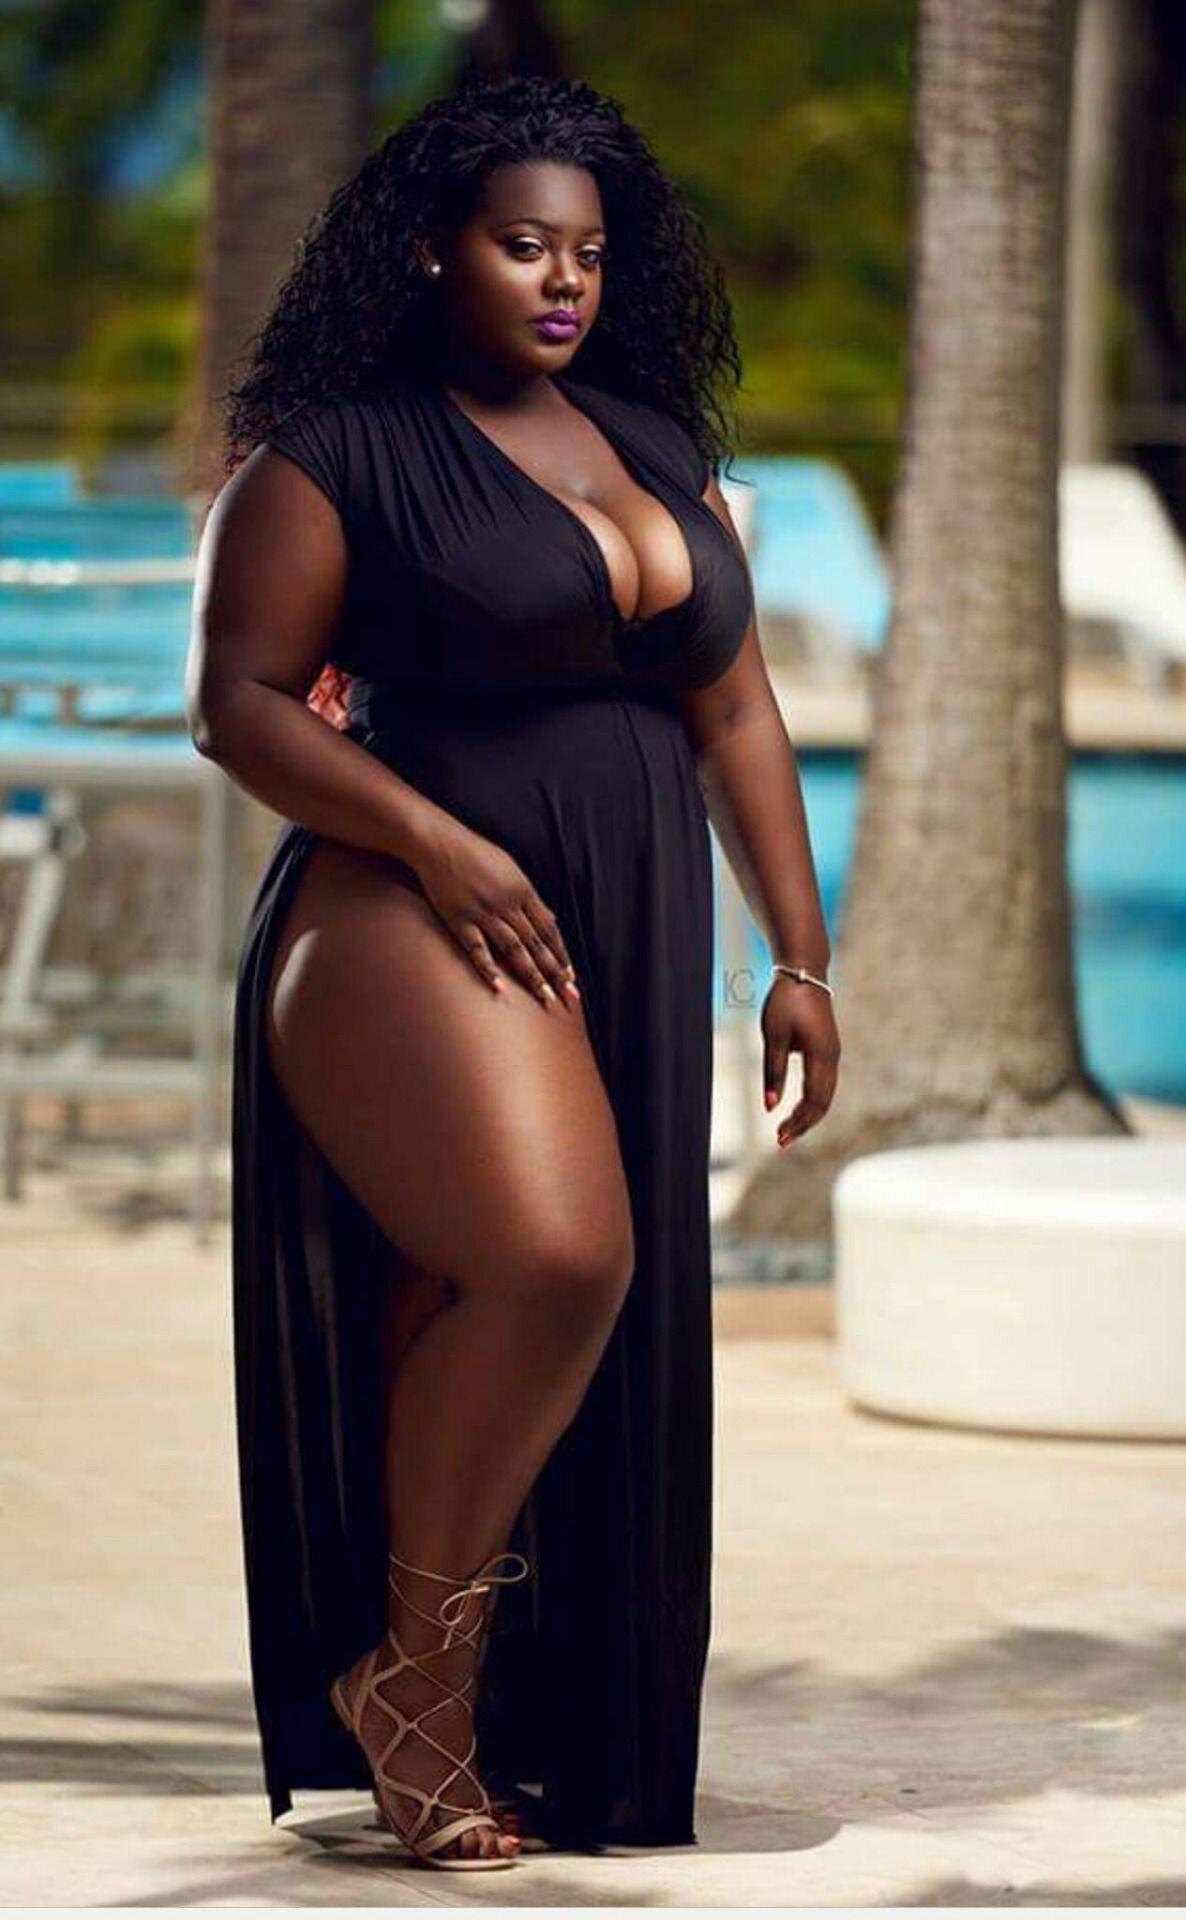 Lee big thick black women emo man see